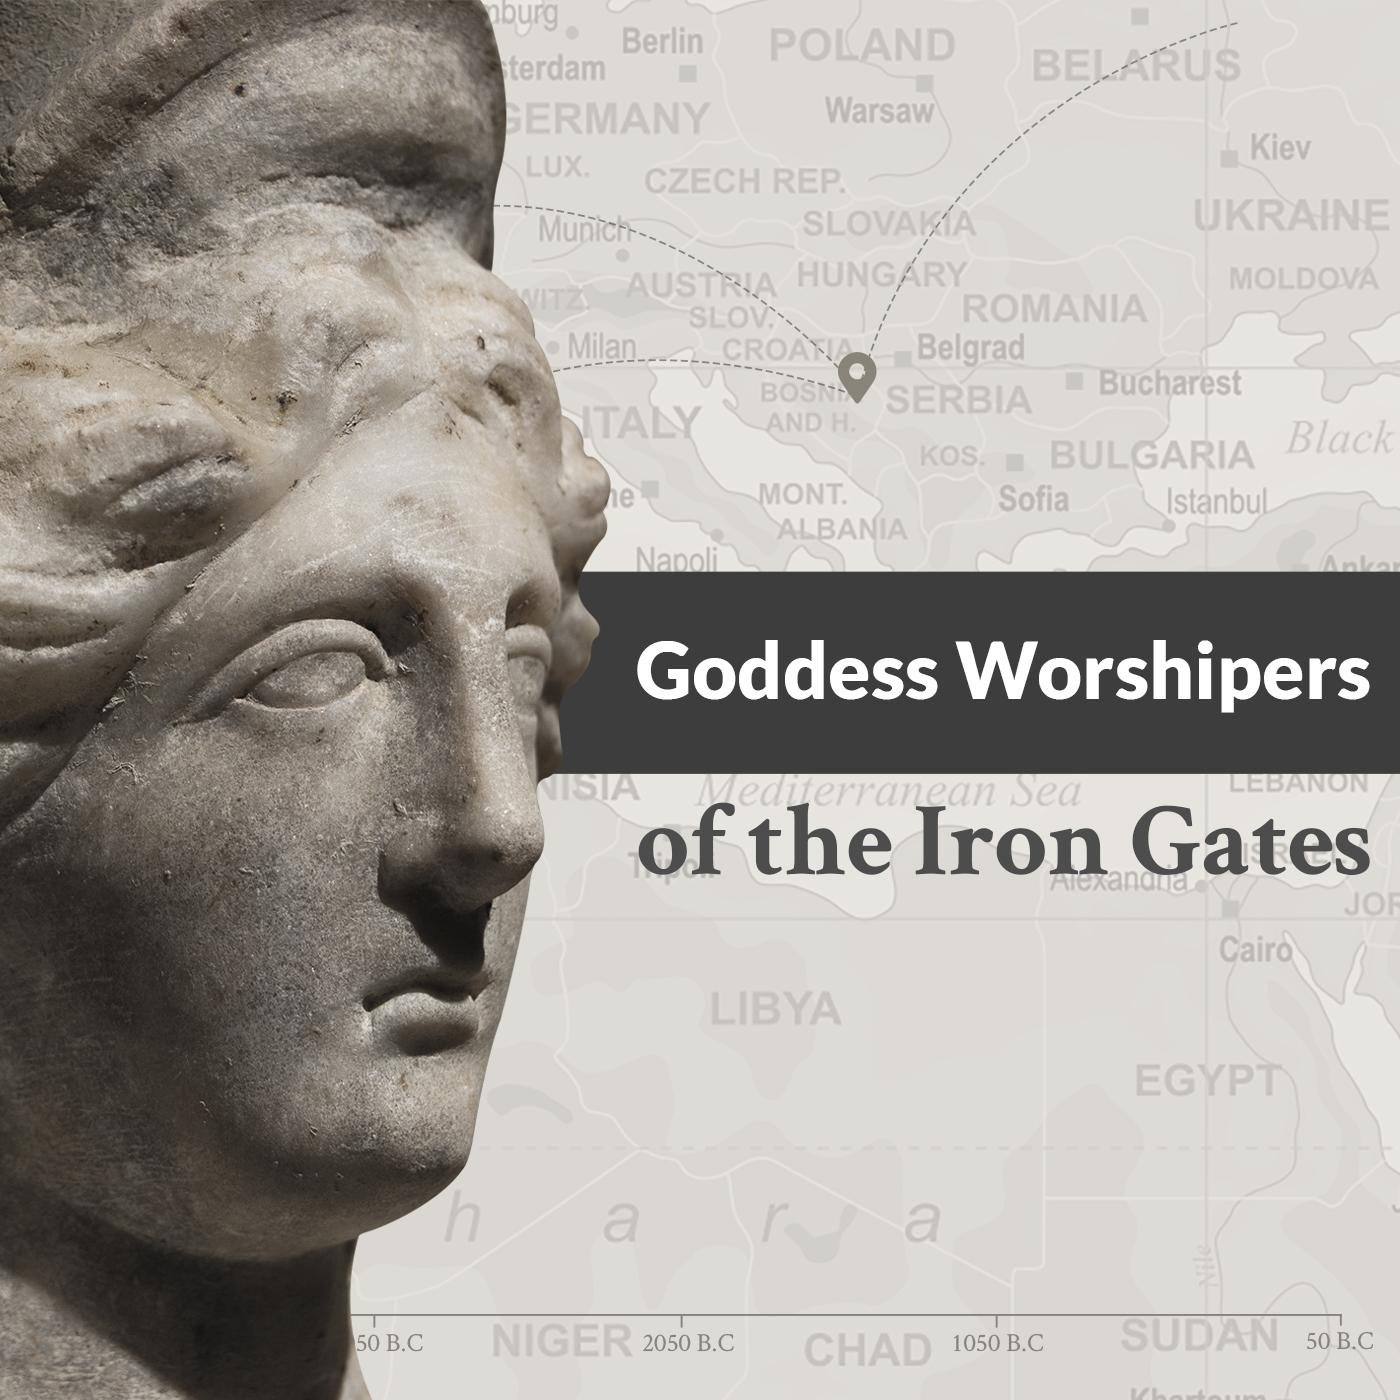 Goddess Worshipers of the Iron Gates